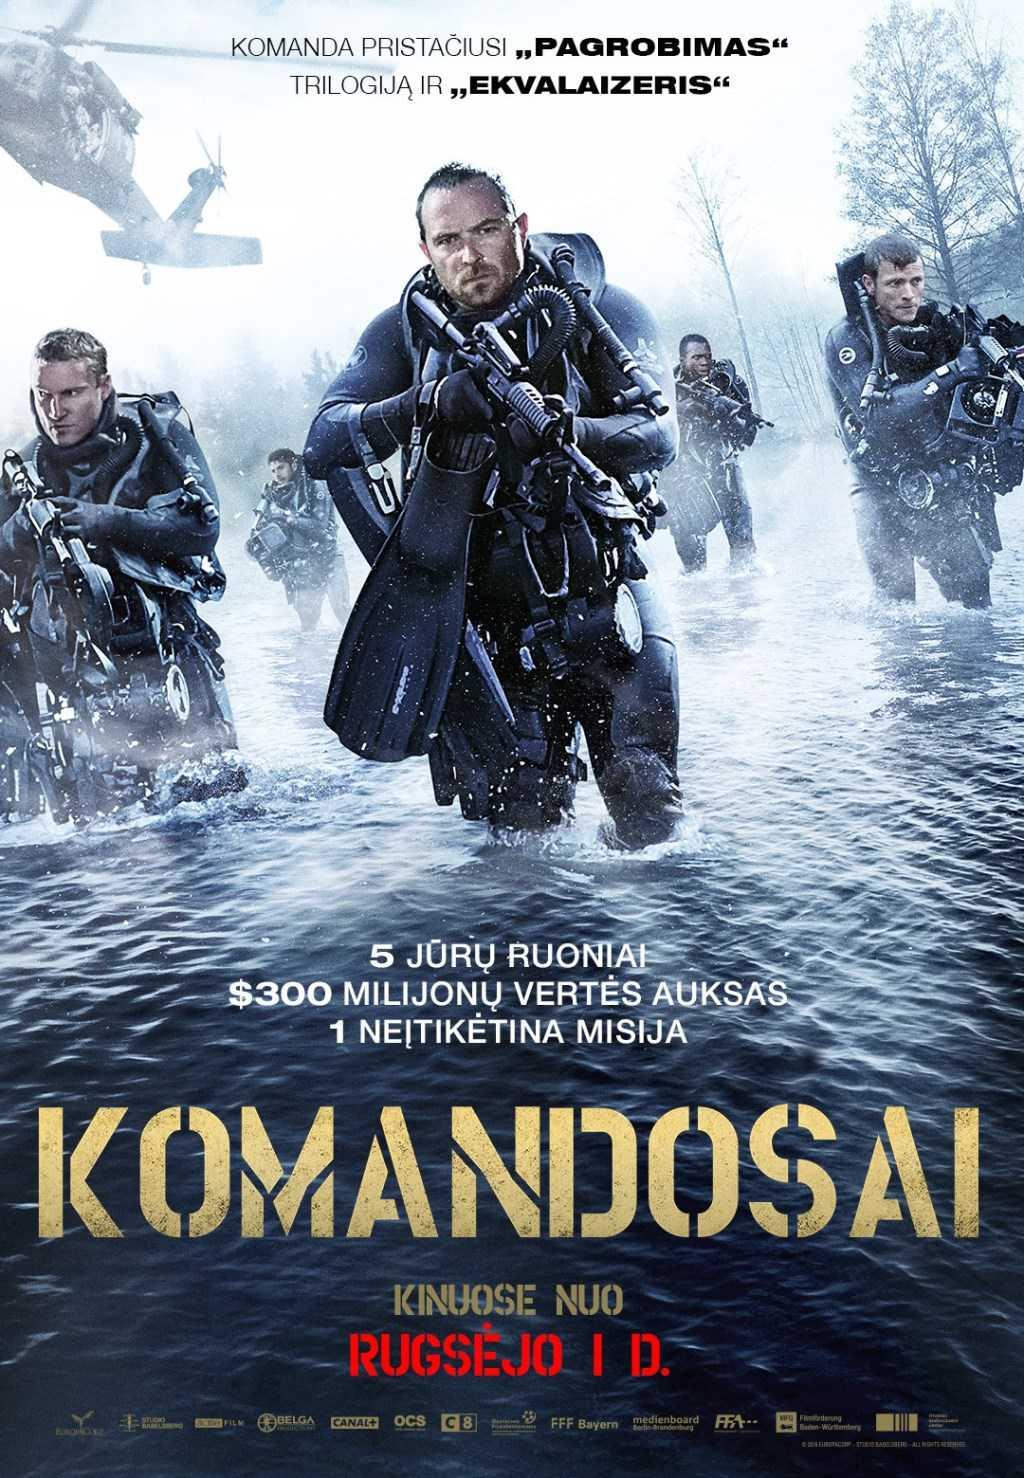 Komandosai (Renegades)